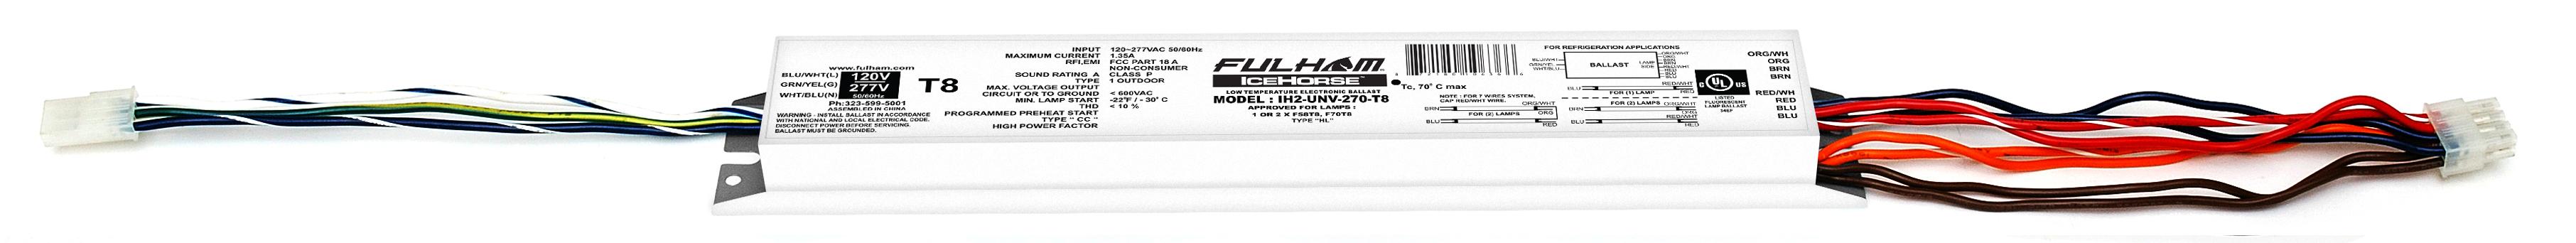 FHM IH2-UNV-270-T8 ICEHORSE (1-2) F25-F32-F40-F58-F70...T8 (1-2) F48-F60?T8HO (1) F72T8HO? (1-2)F48-F60 T10VHO? (1-2) F48-F60-F72 T12HO? (1) F96T12HO?(1) F96T12VHO